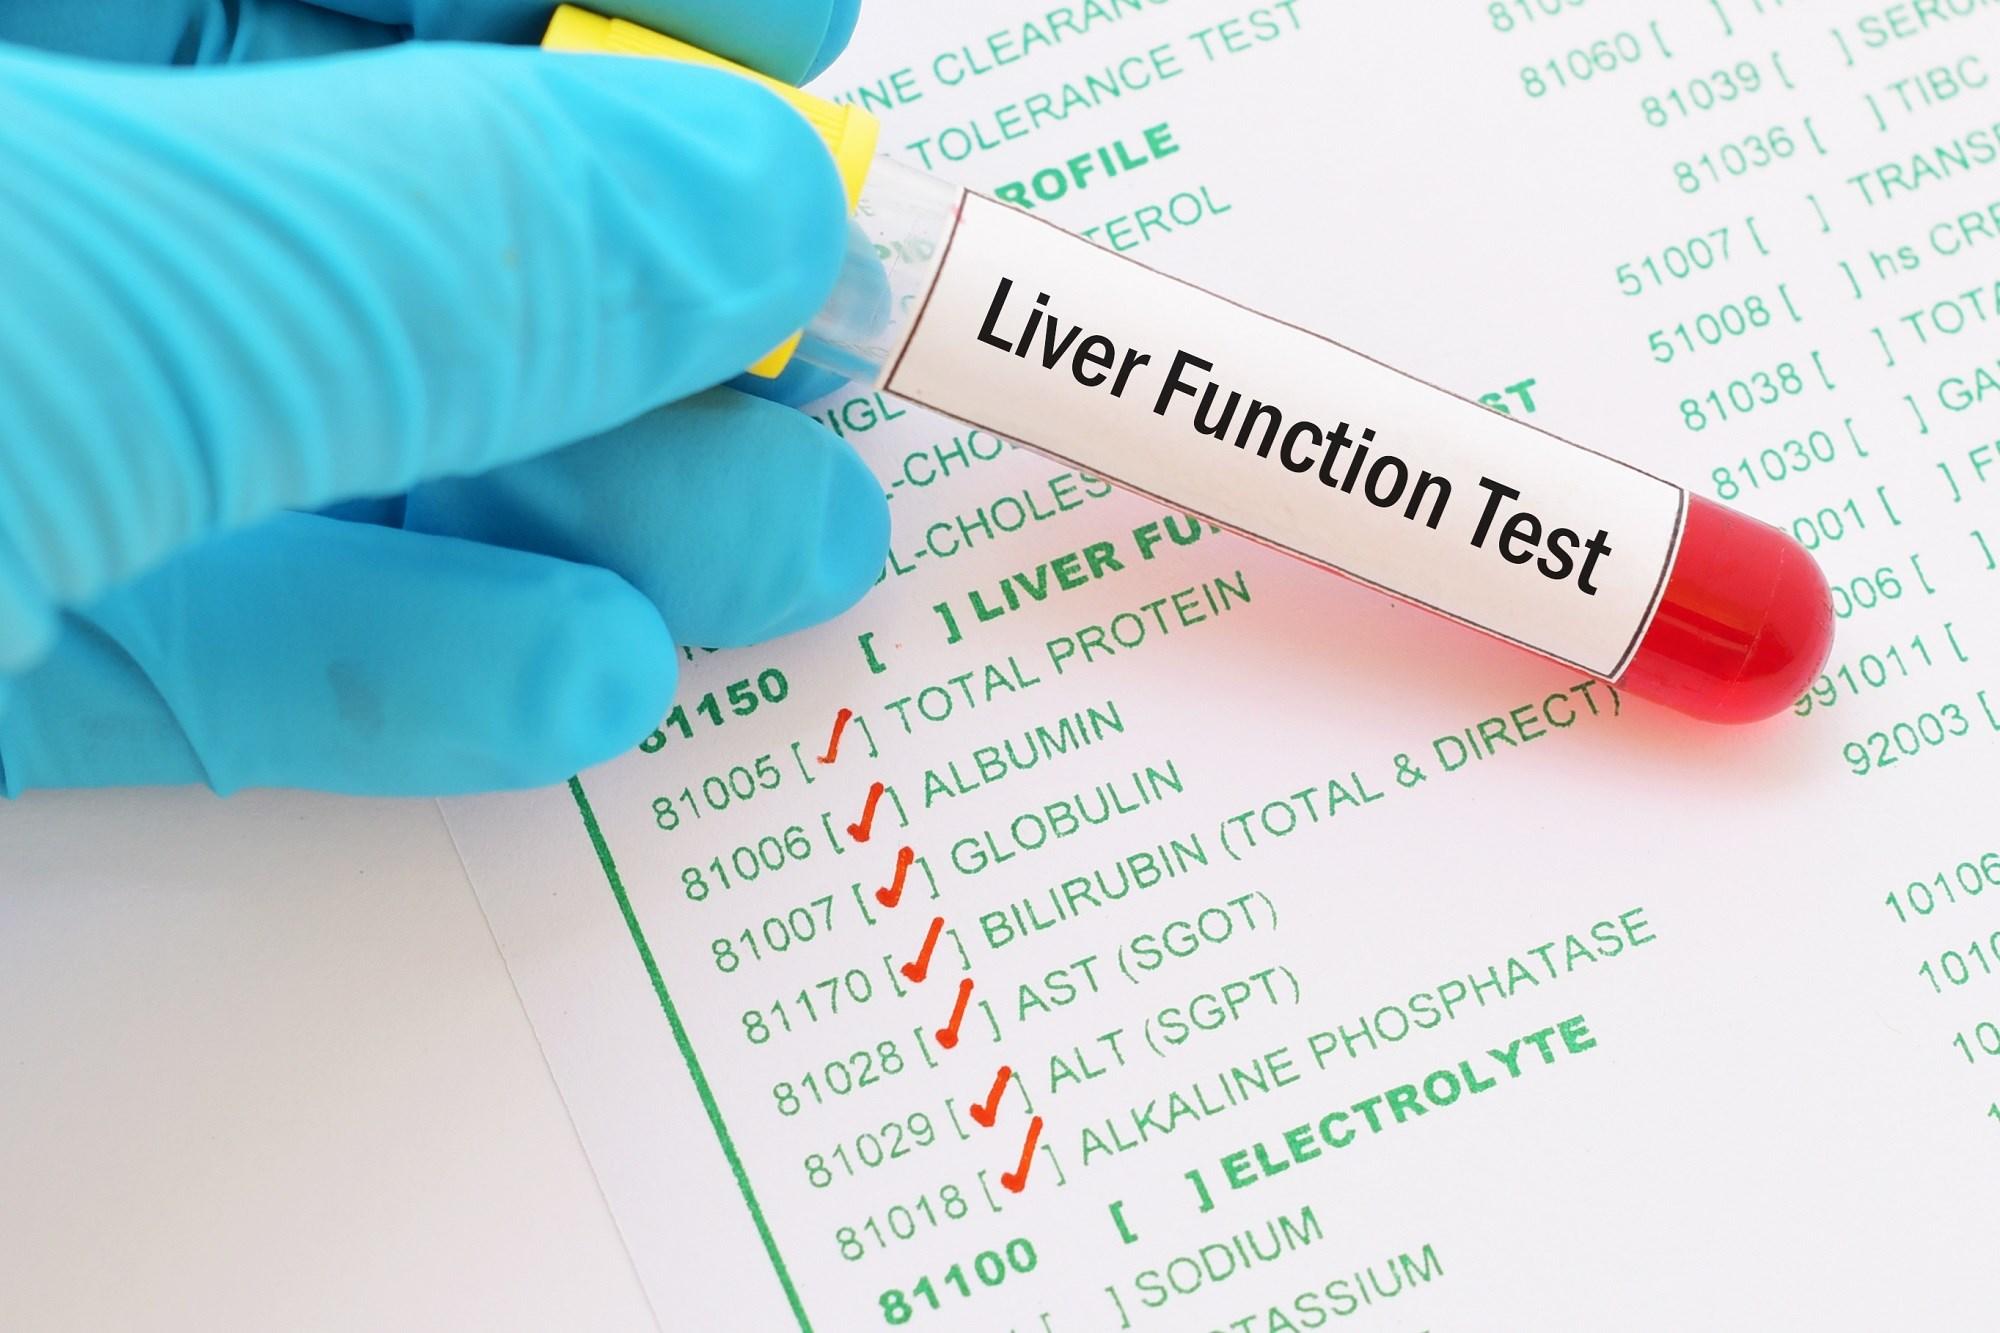 Hepatic Markers Linked to Early Predictors of Type 2 Diabetes Risk in Women